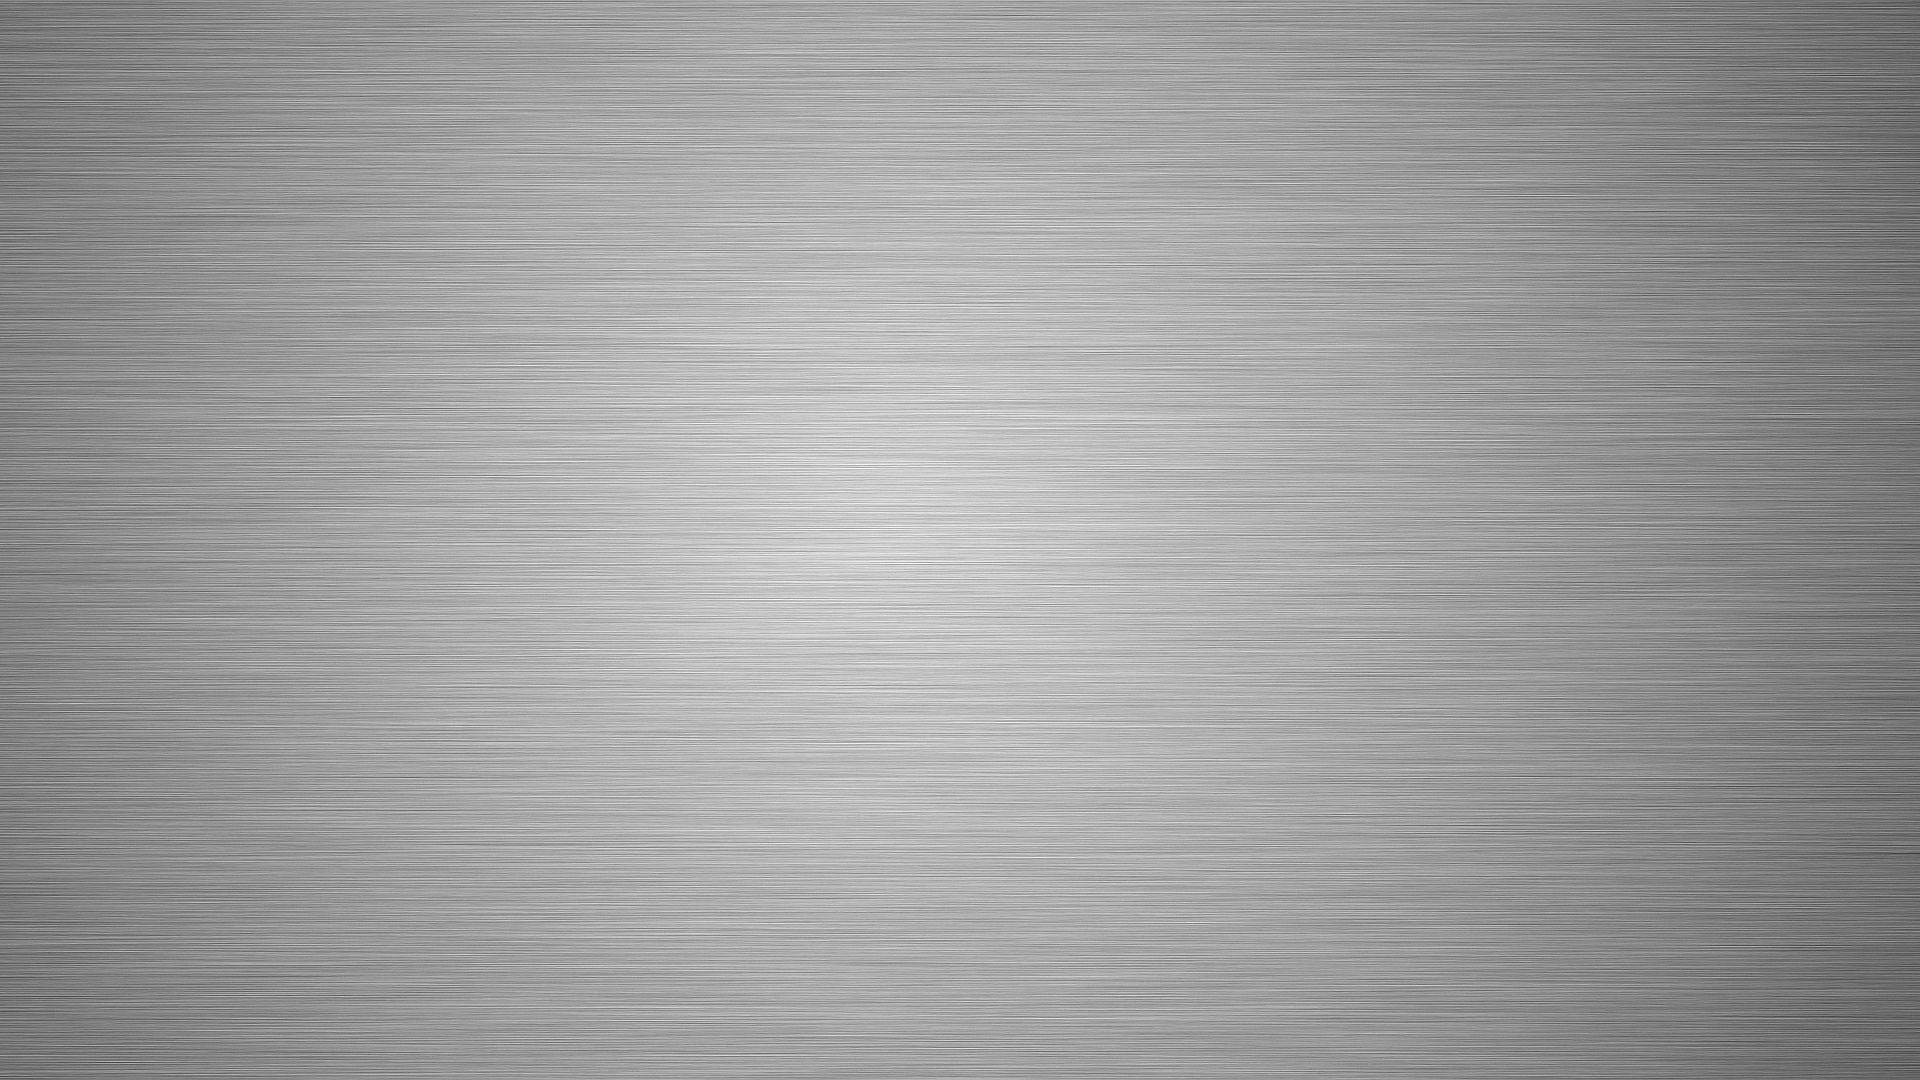 Brushed Aluminum Wallpapers Wallpaper Cave Photography Wallpaper Metallic Wallpaper Desktop Metal